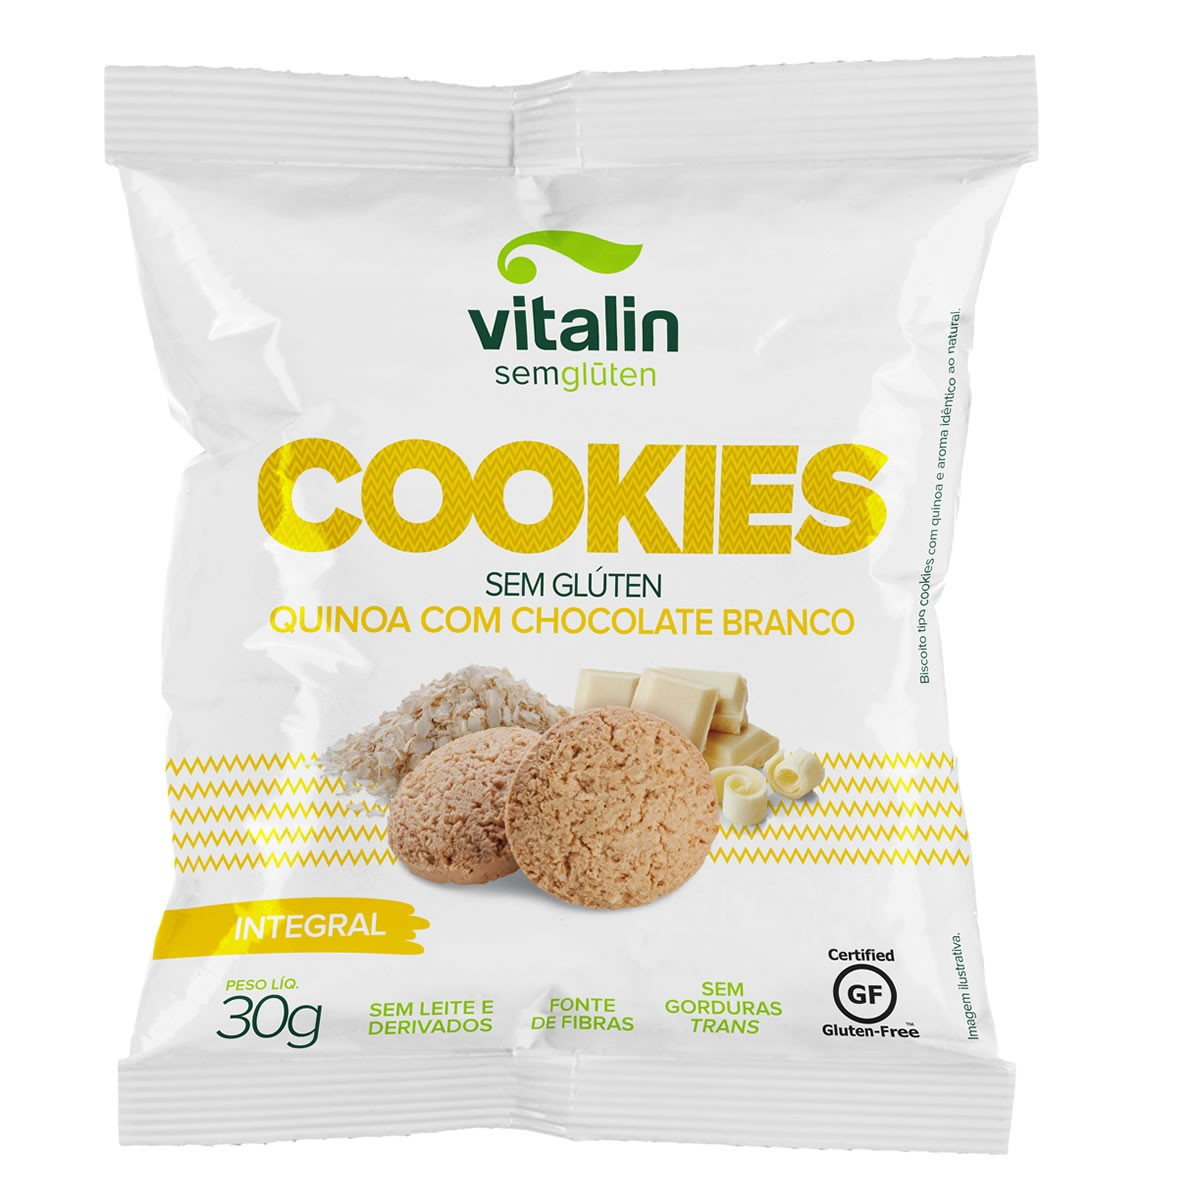 Cookie Sabor Quinoa com Chocolate Branco 30g - Vitalin